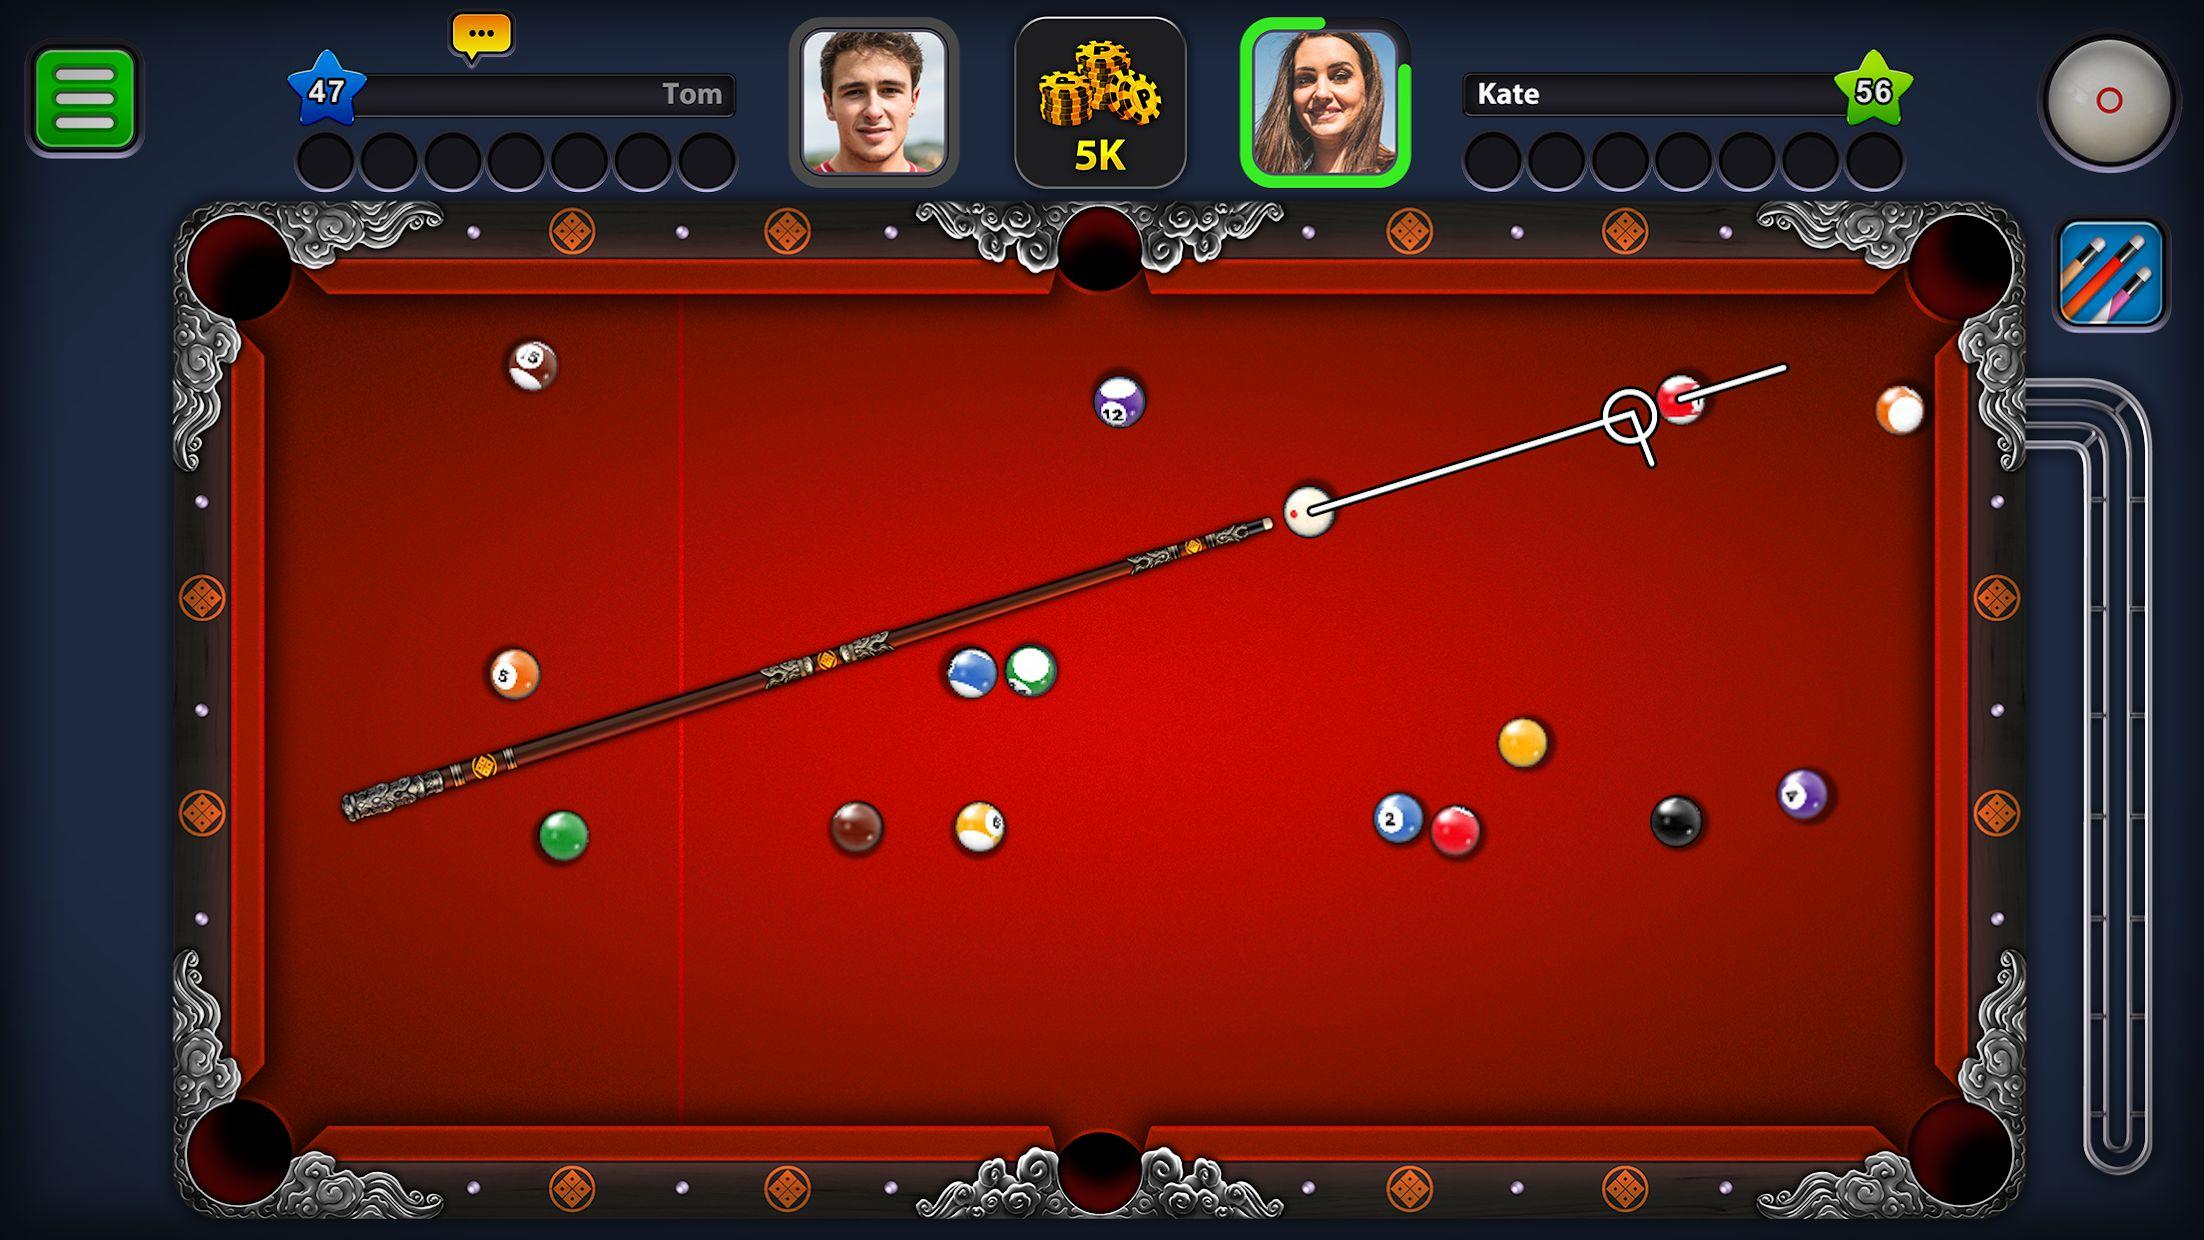 8 Ball Pool 游戏截图2